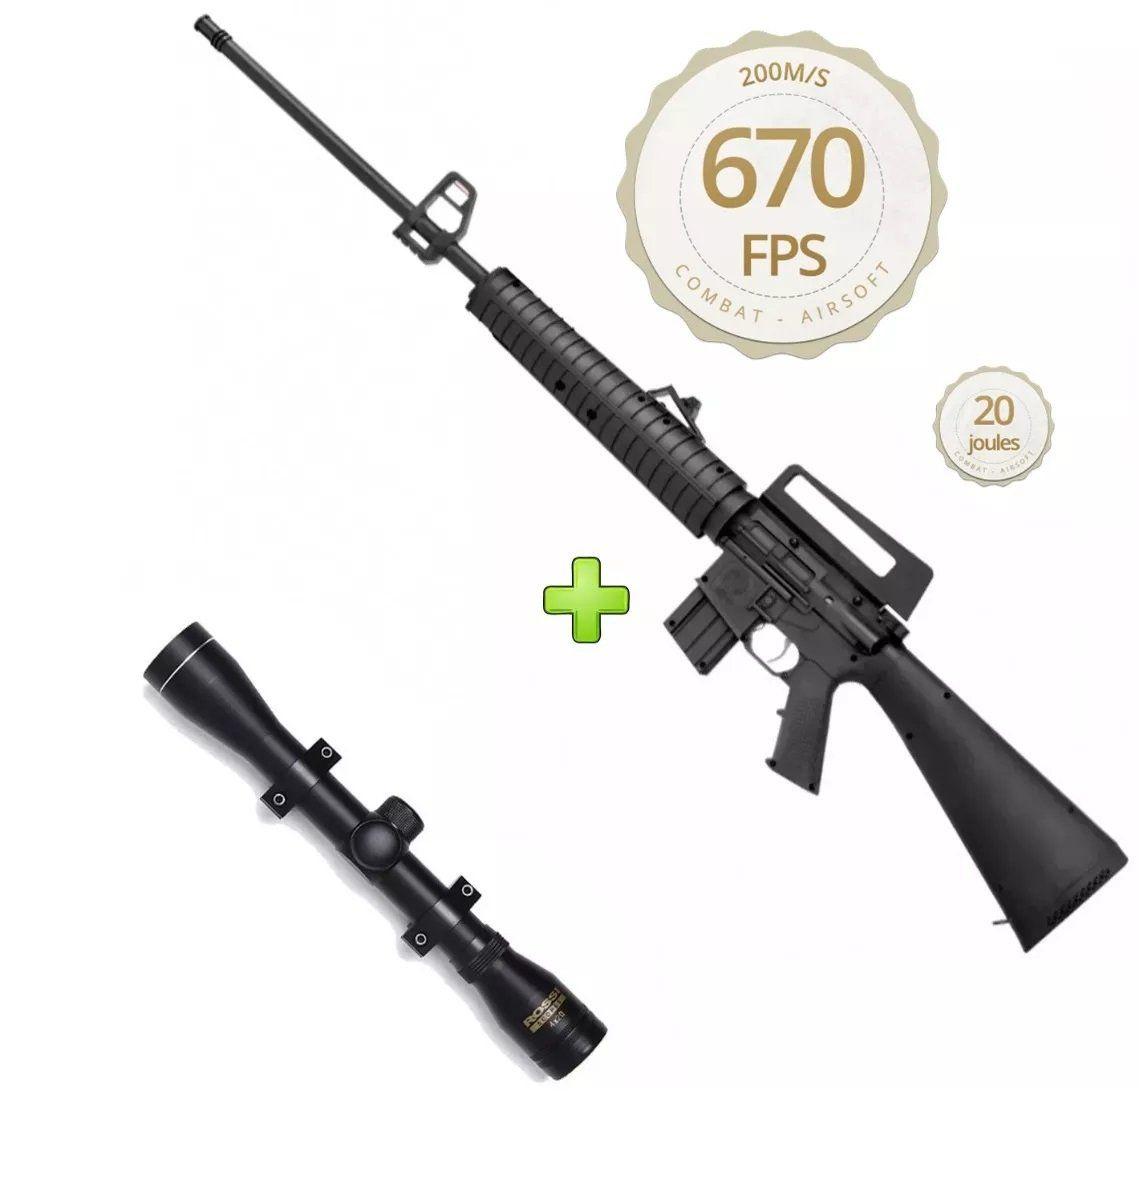 Kit Carabina Pressão Rossi Rifle M-16 R S - 5,5mm + Luneta 4x20